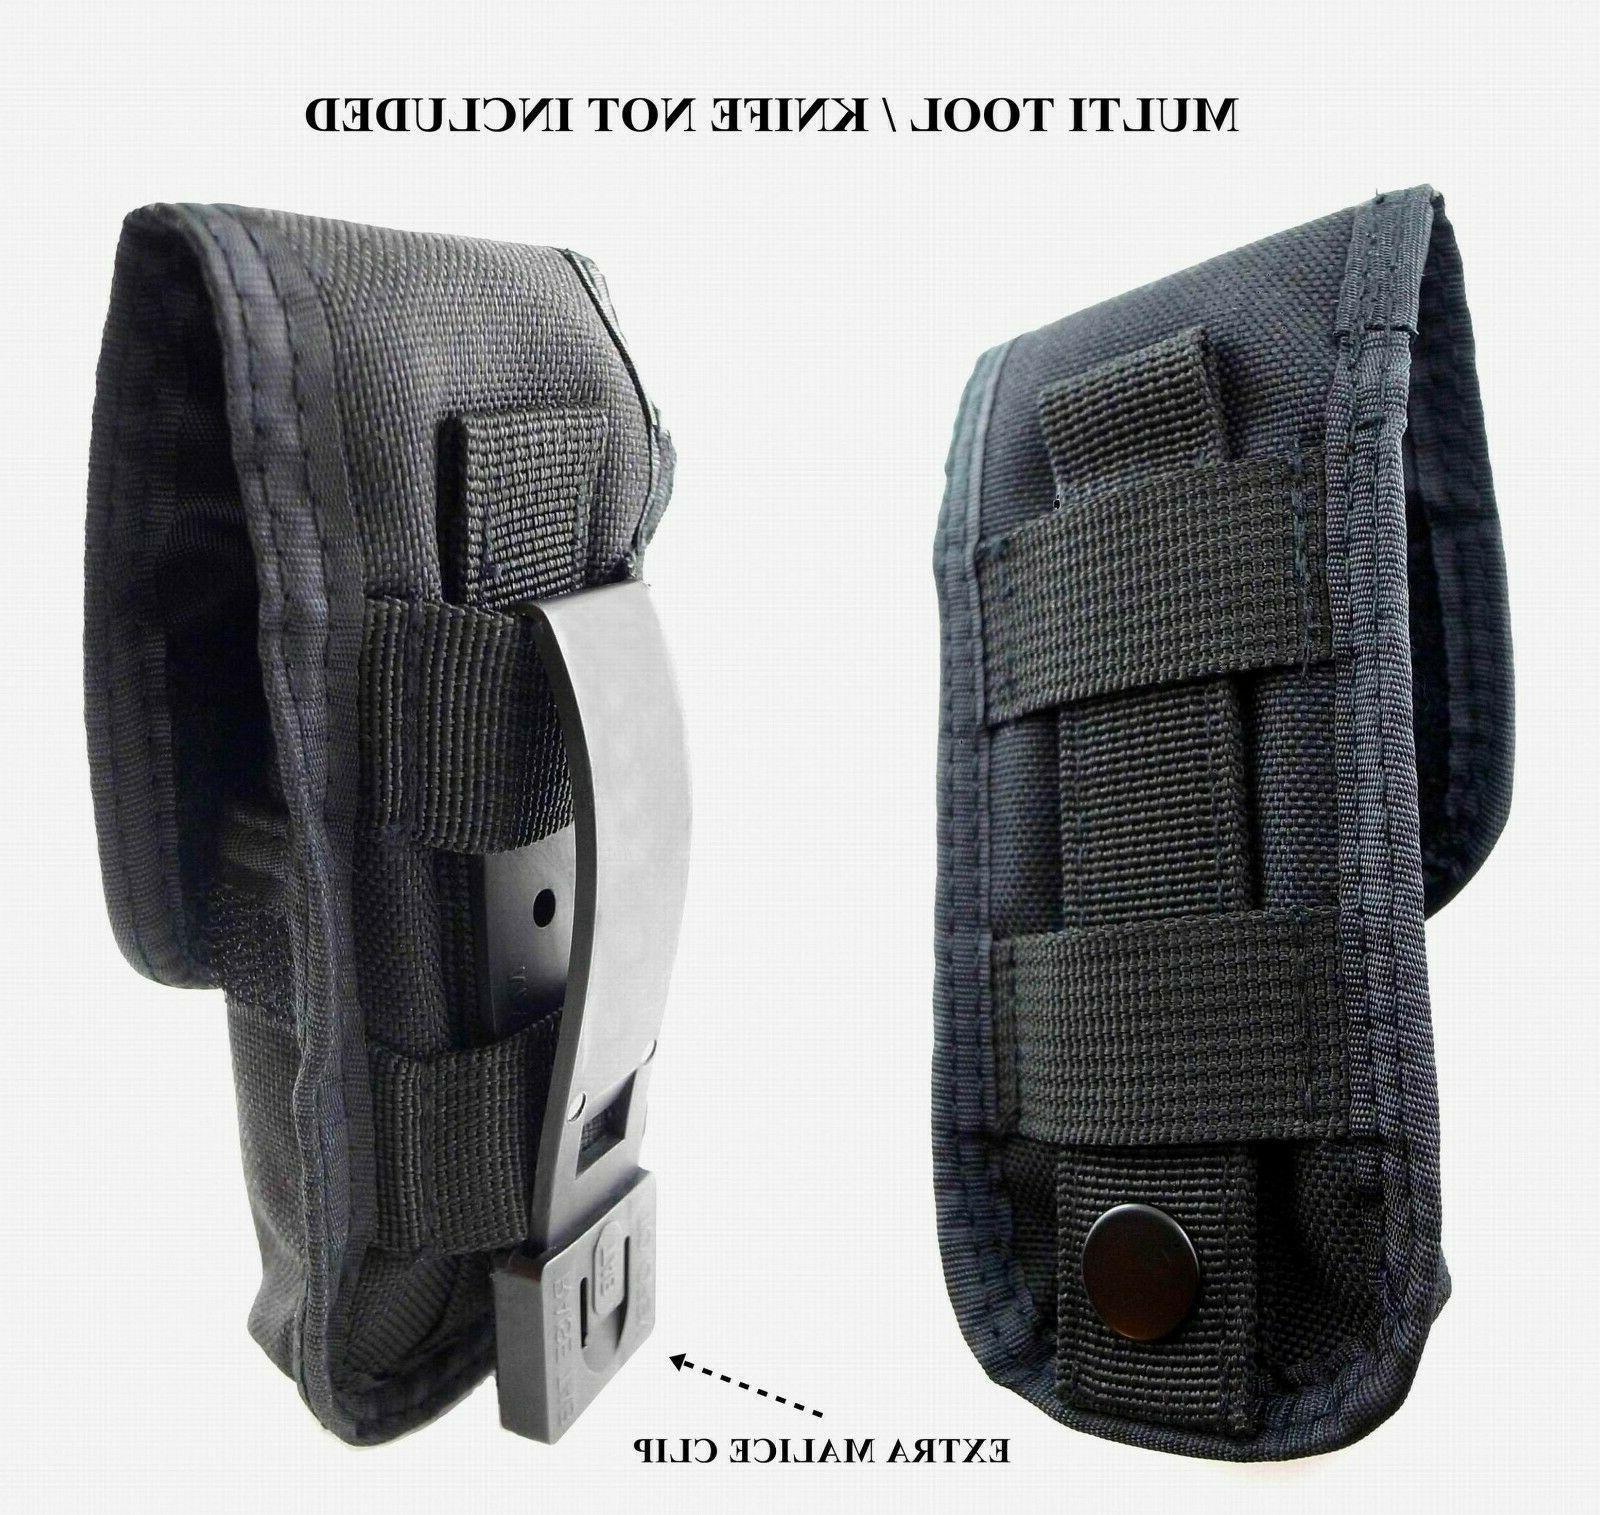 2 GERBER & MUTILTOOL POUCH/SHEATH FIT FOR AUTO NR